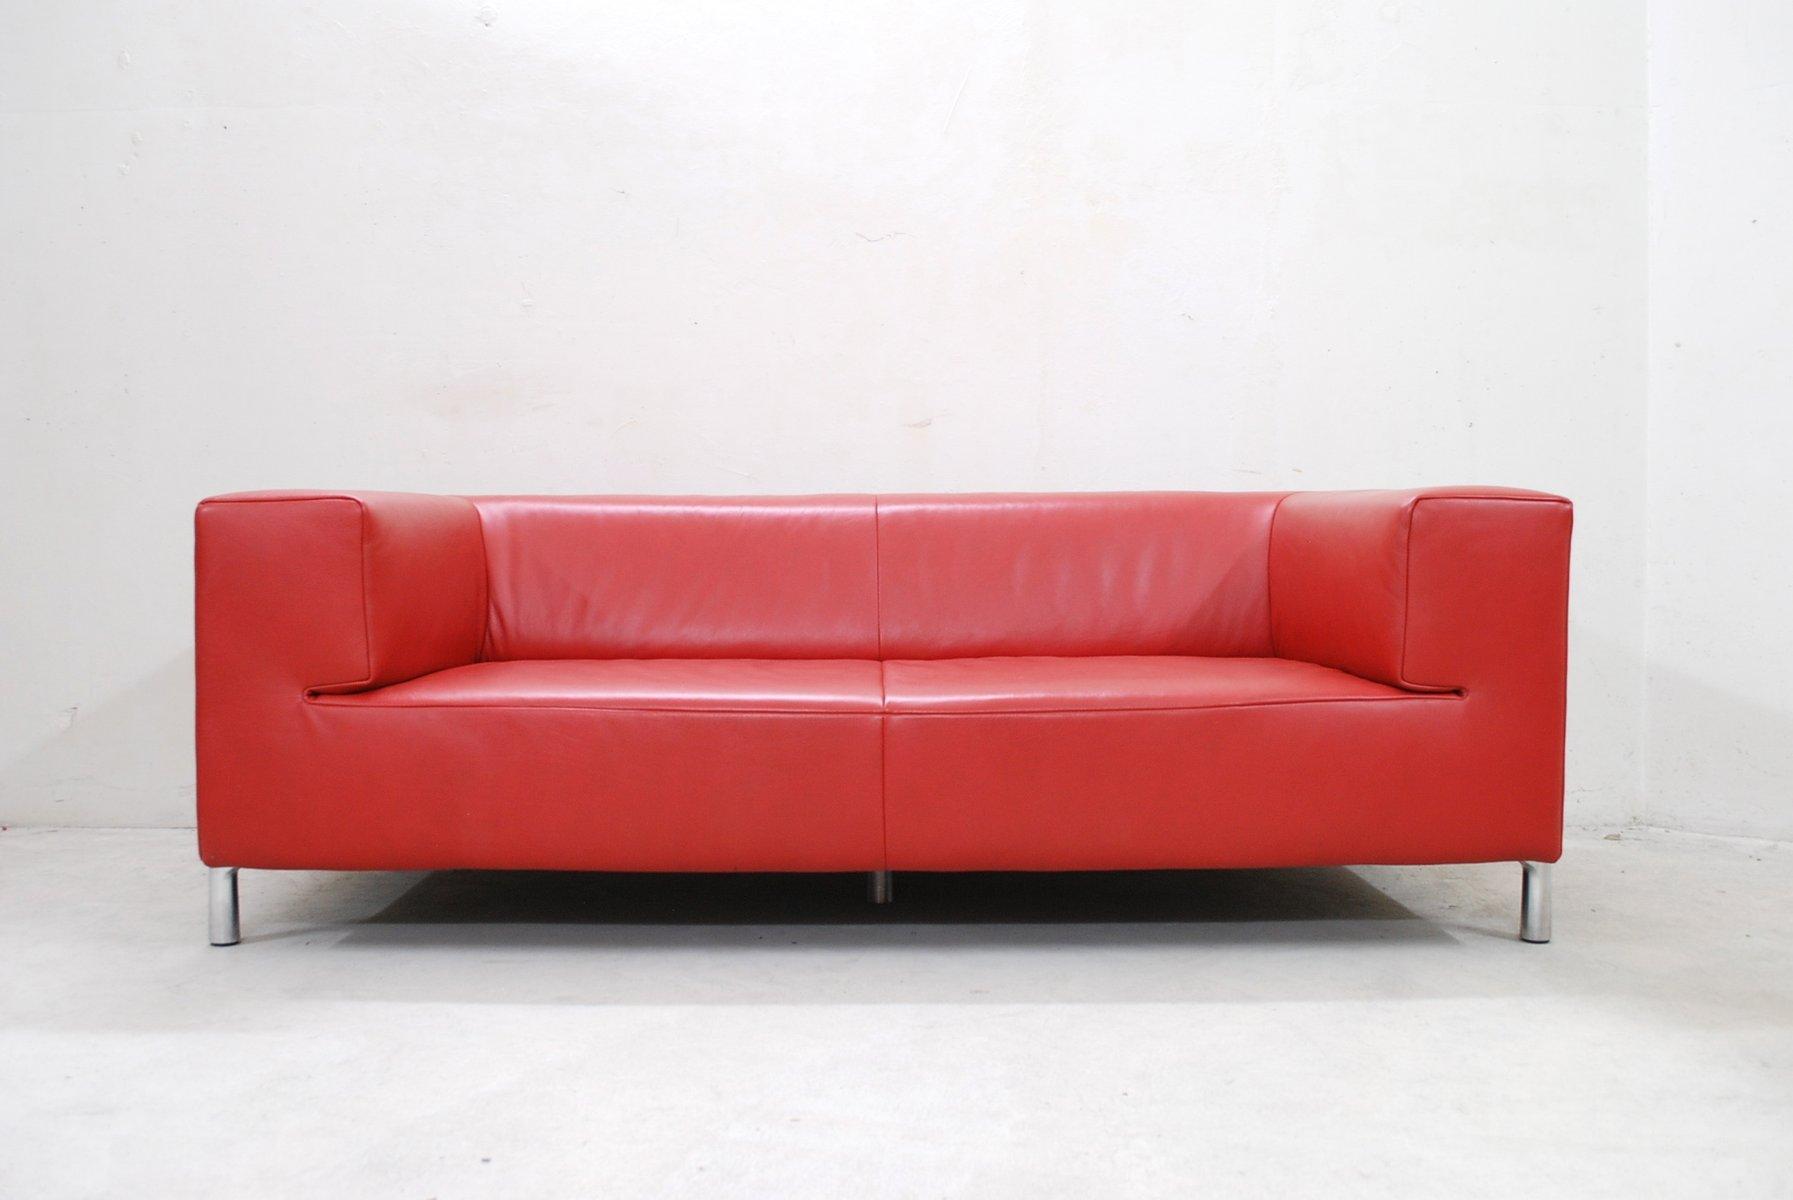 rotes vintage genesis ledersofa von koinor bei pamono kaufen. Black Bedroom Furniture Sets. Home Design Ideas